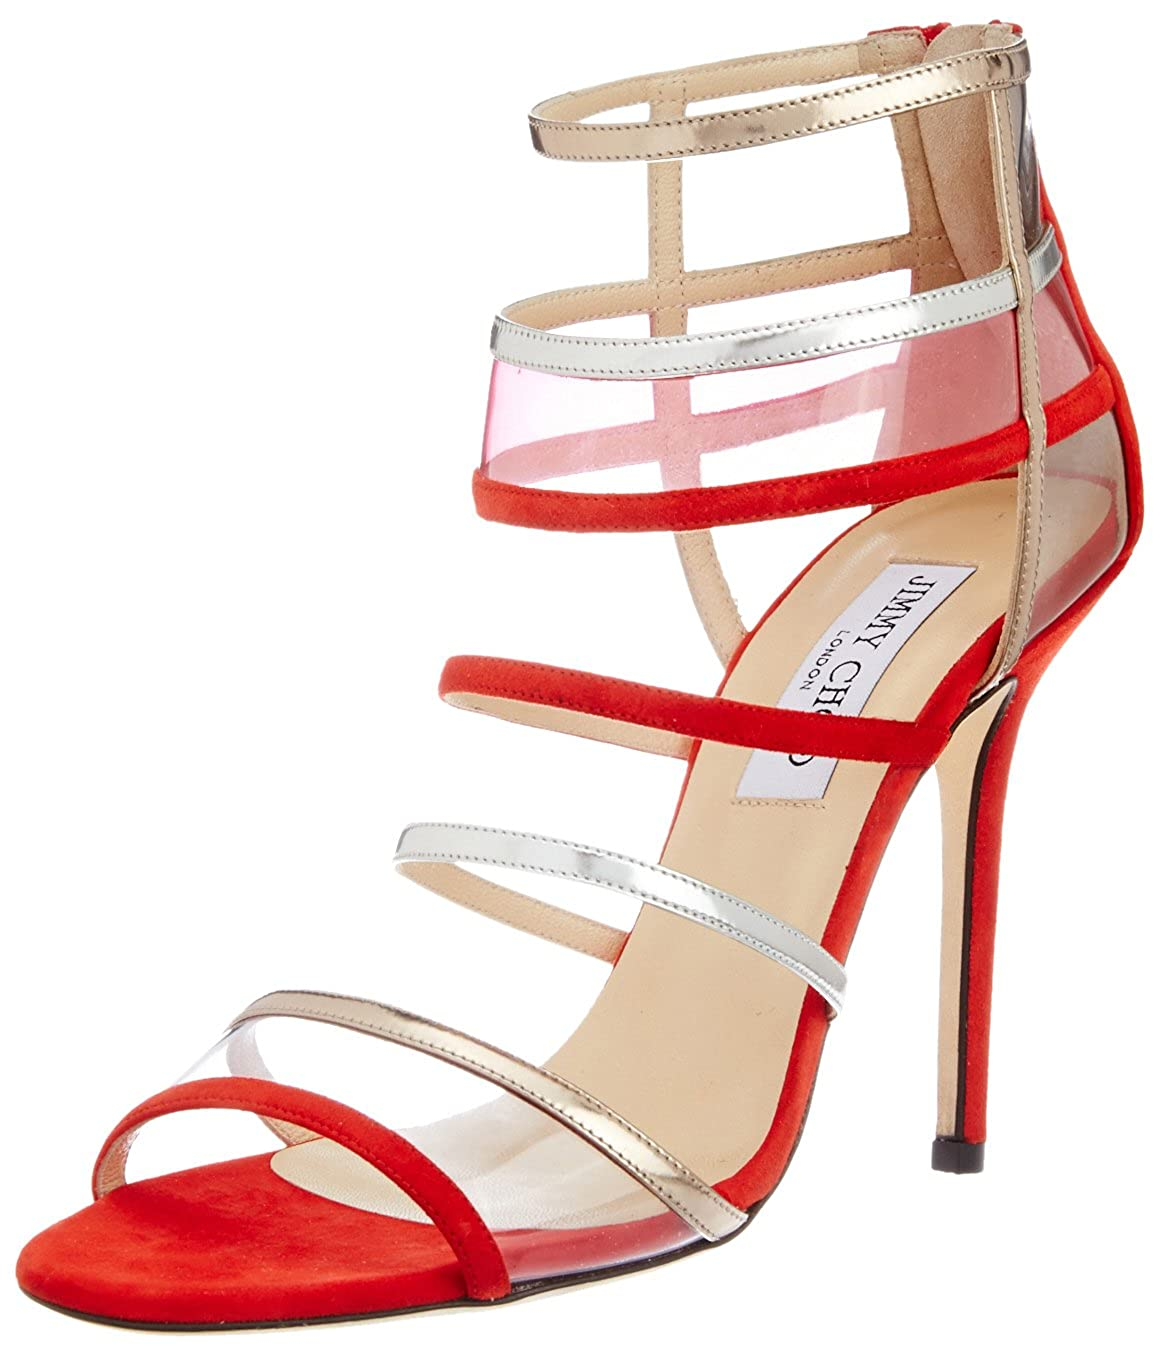 Buy Vogue Jimmy Choo Women's Red